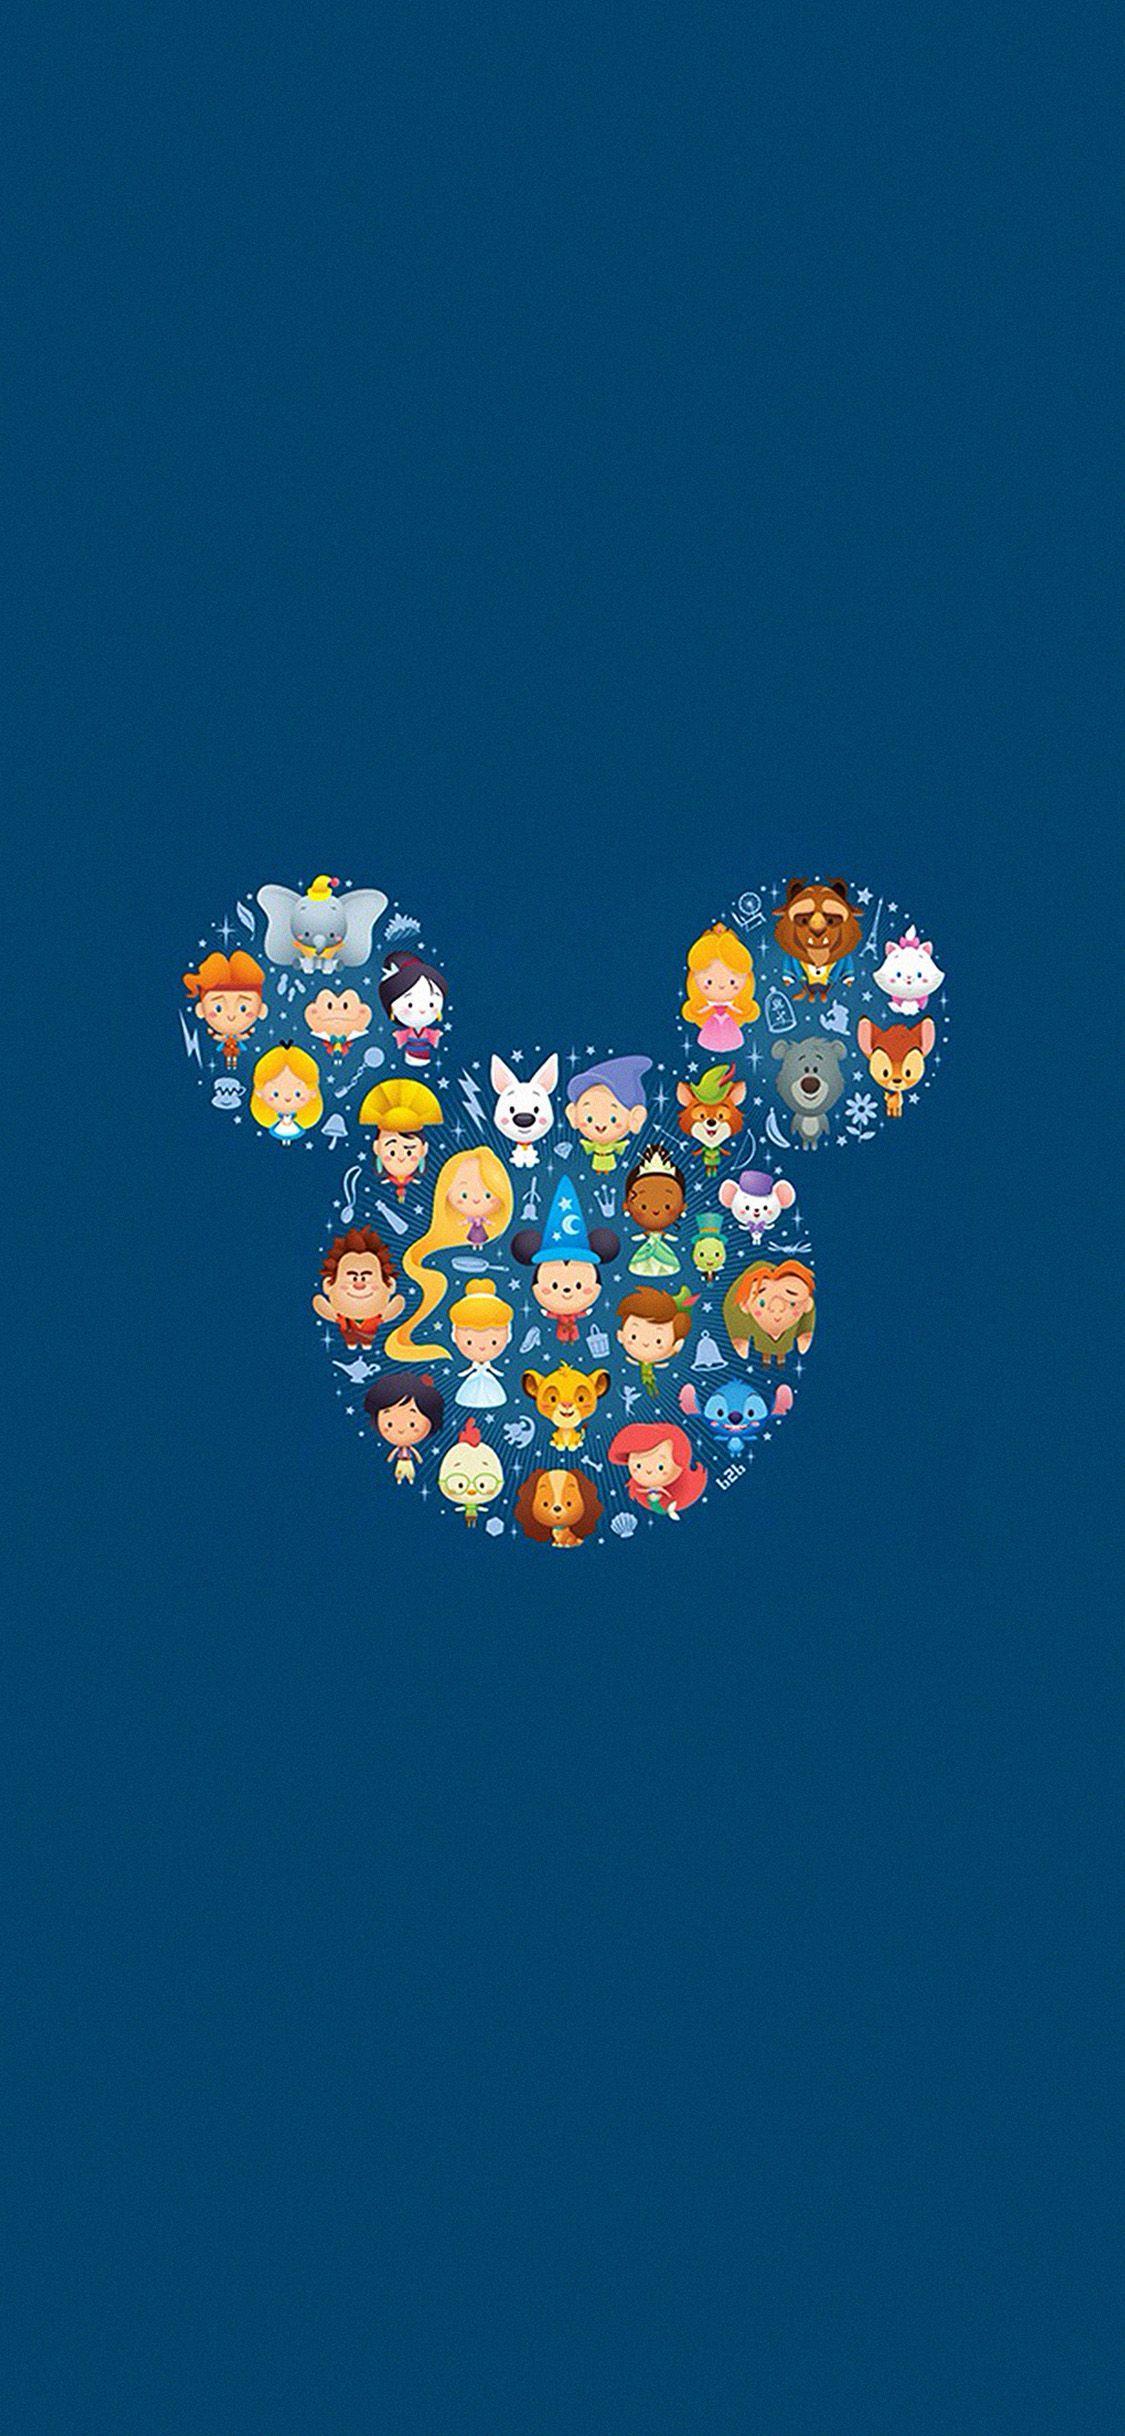 Cute Disney Iphone Wallpapers Top Free Cute Disney Iphone